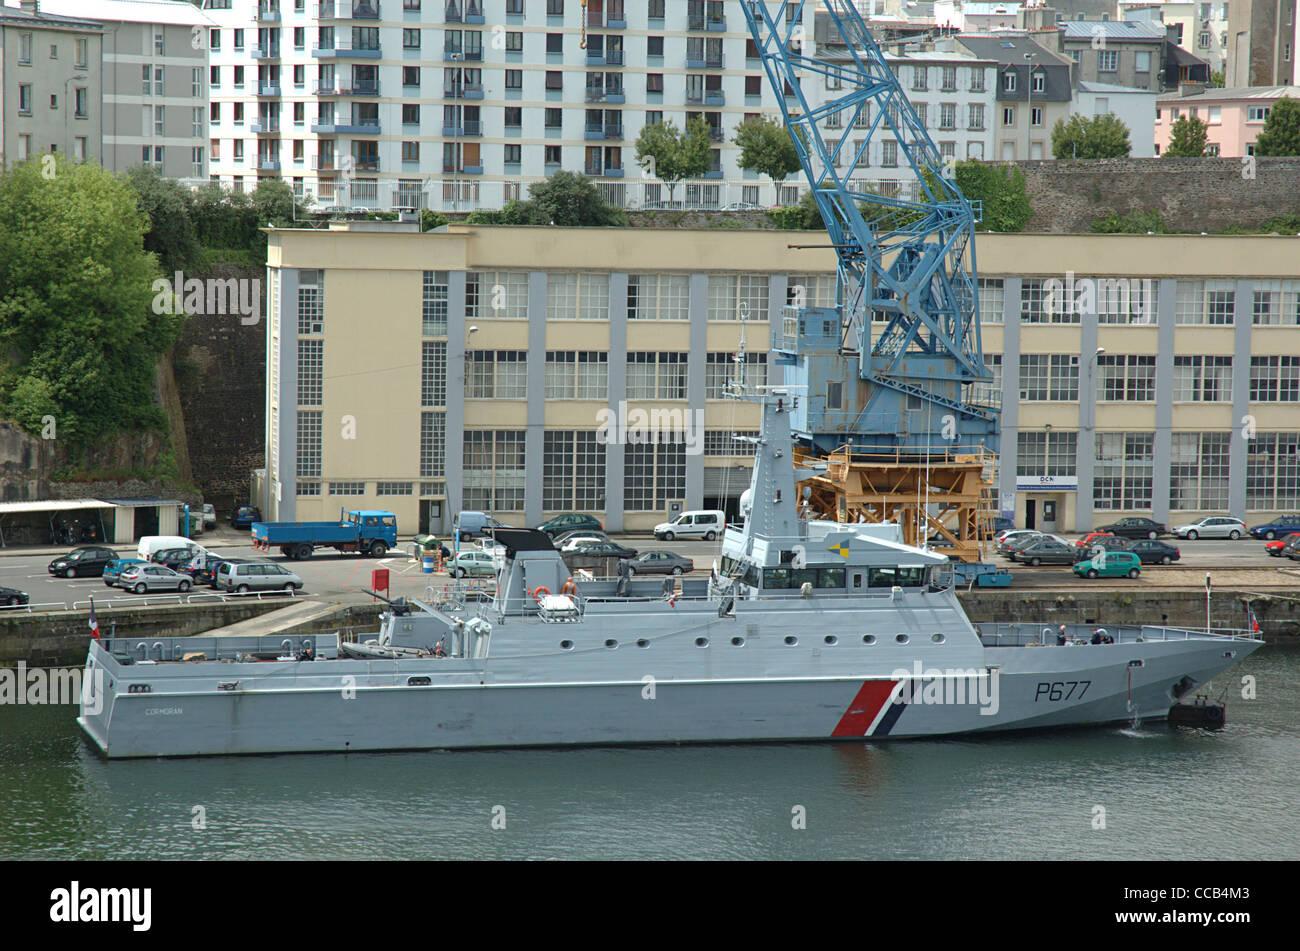 Cormoran (P677), a French navy ship. Brest, Finistère, Bretagne, France. - Stock Image